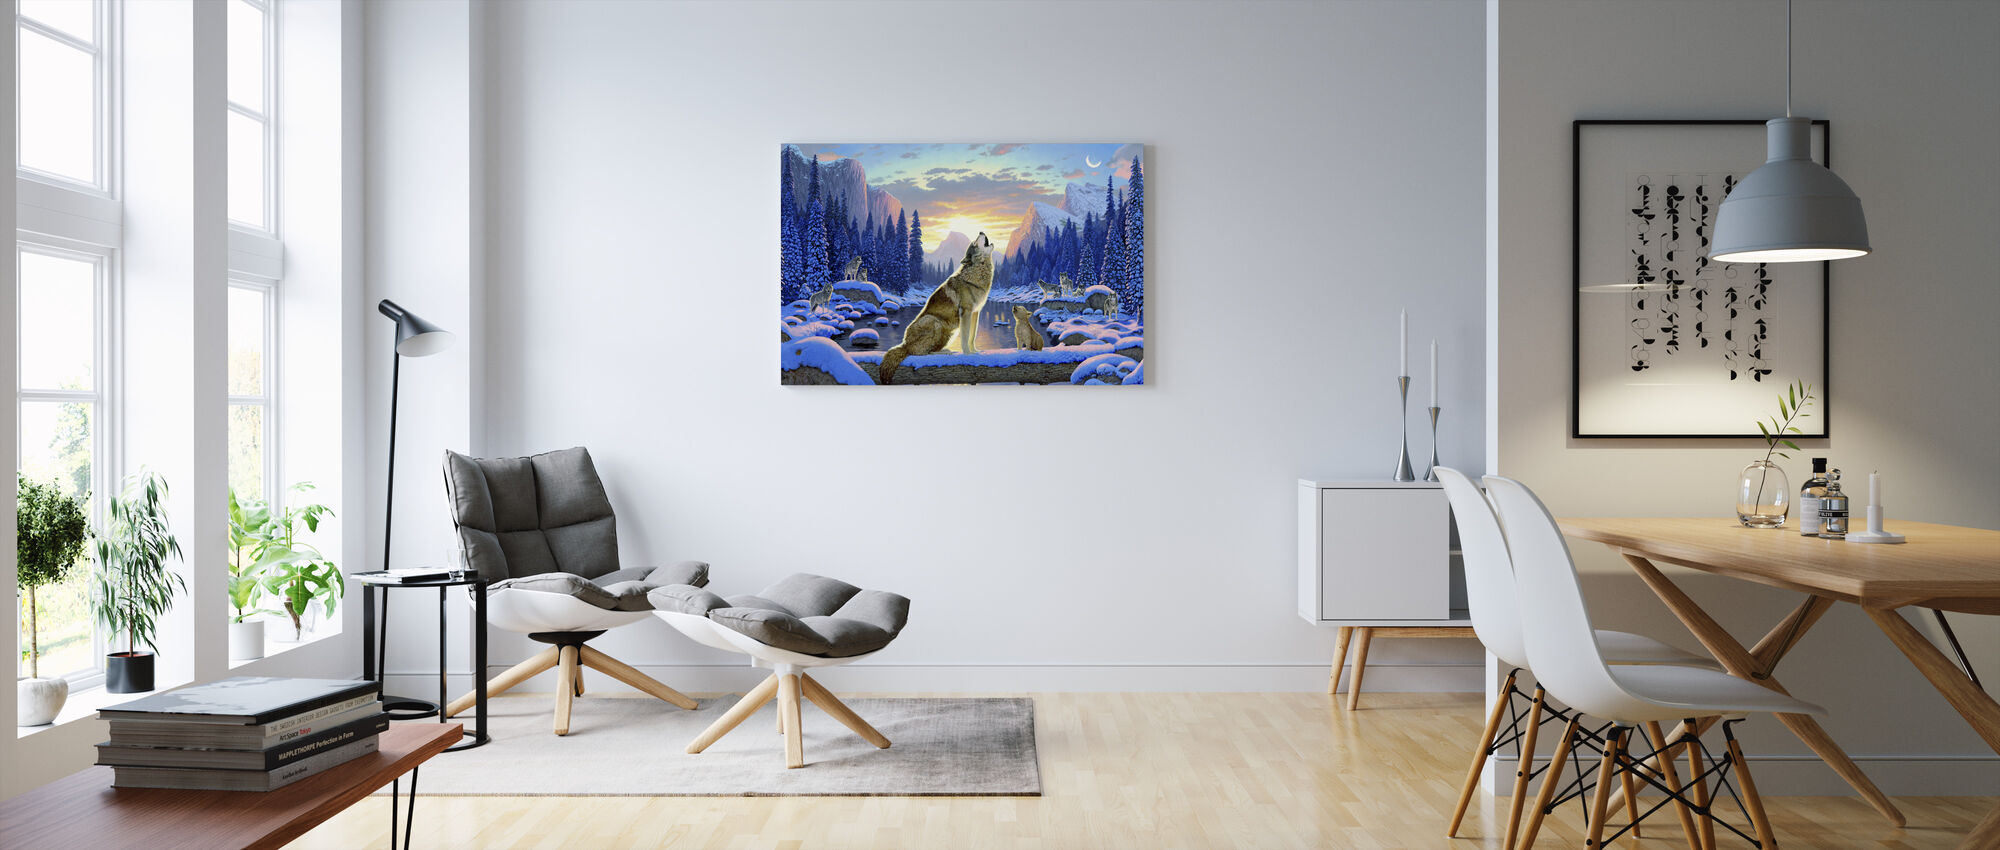 Sittande varg och unge - Canvastavla - Vardagsrum